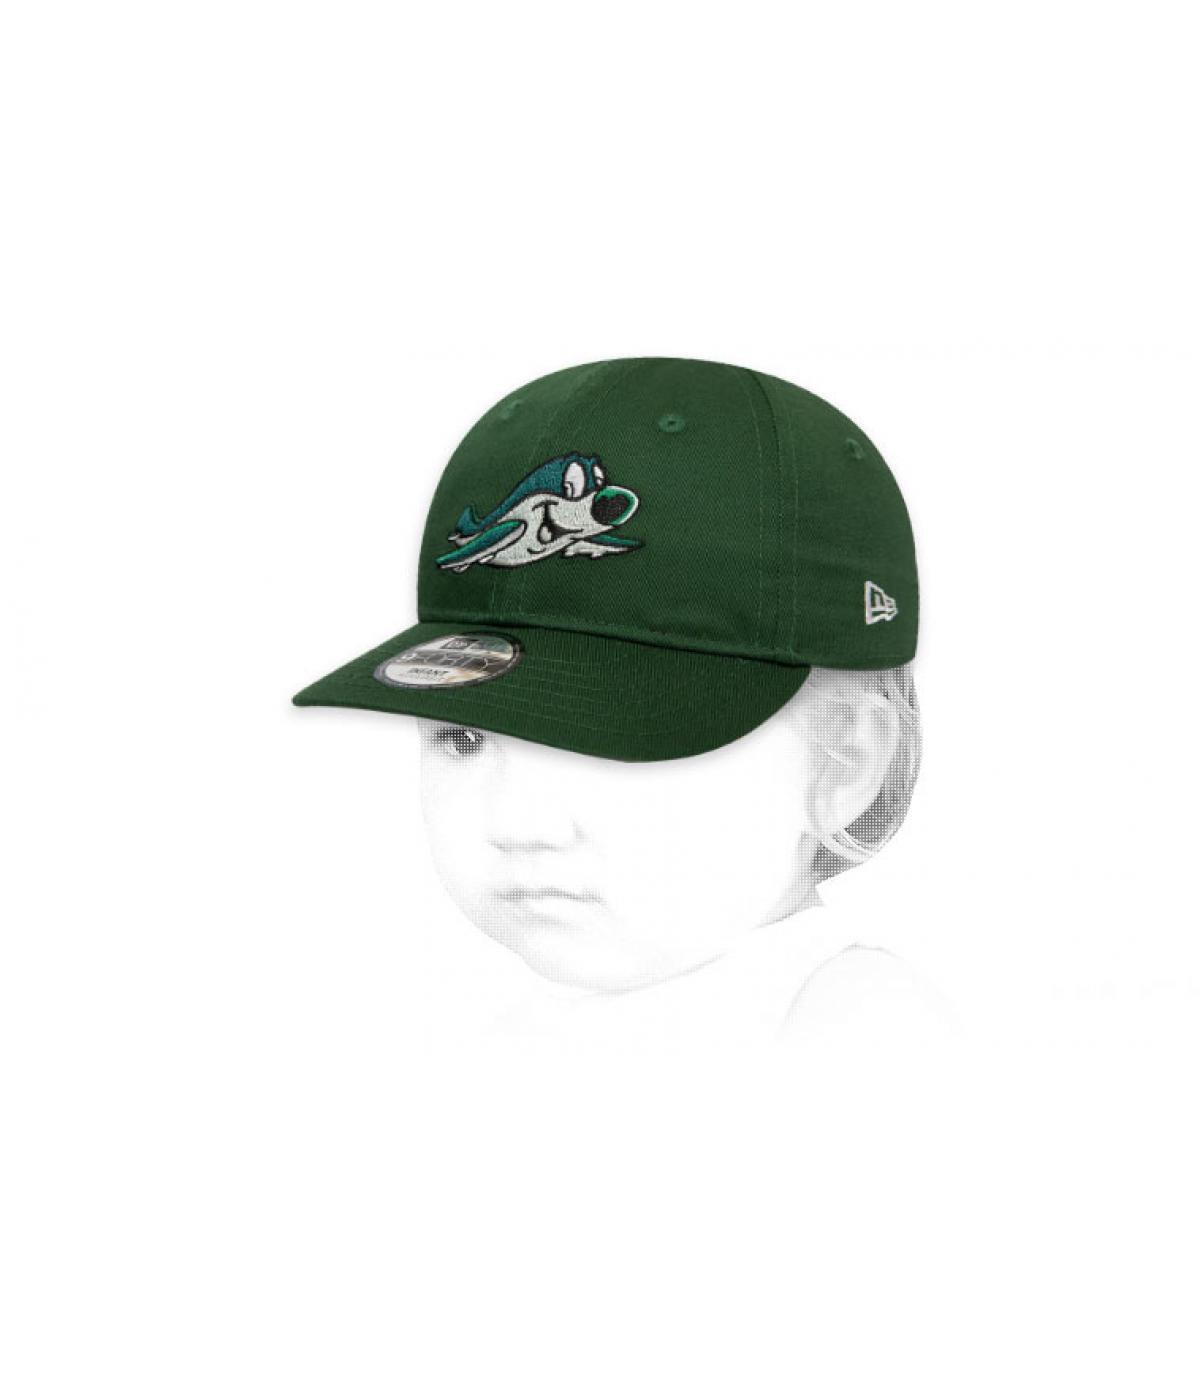 green kids Jets cap